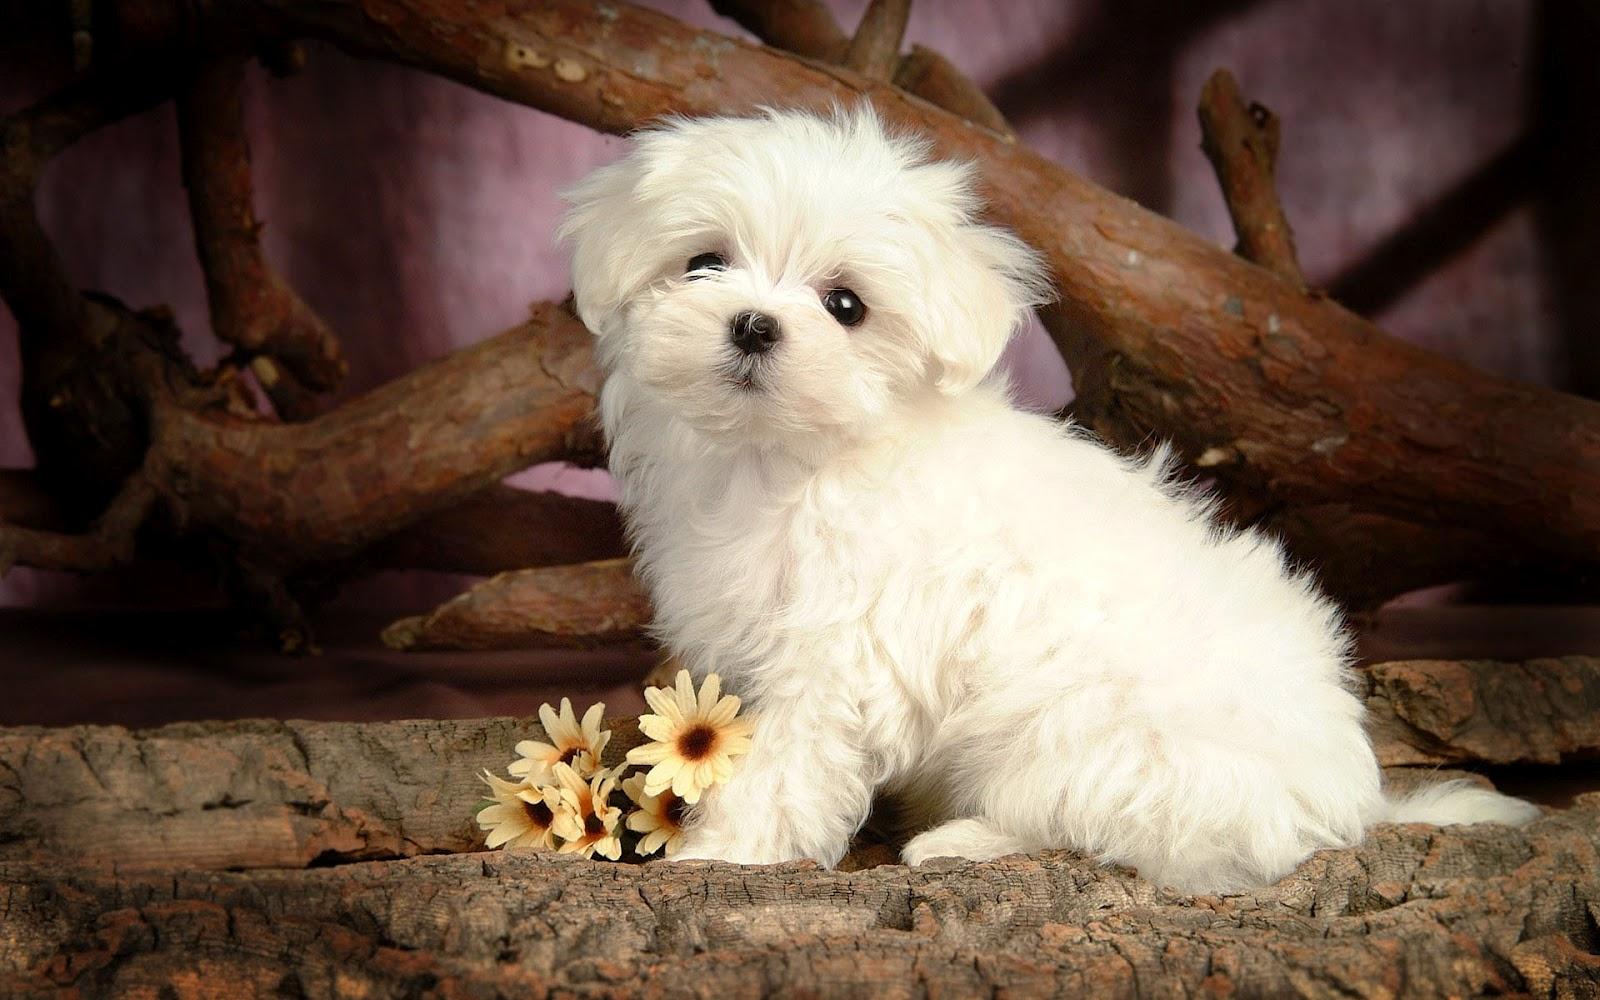 Cute Puppy Dog Wallpapers 1600x1000 Fondo De Pantalla 899